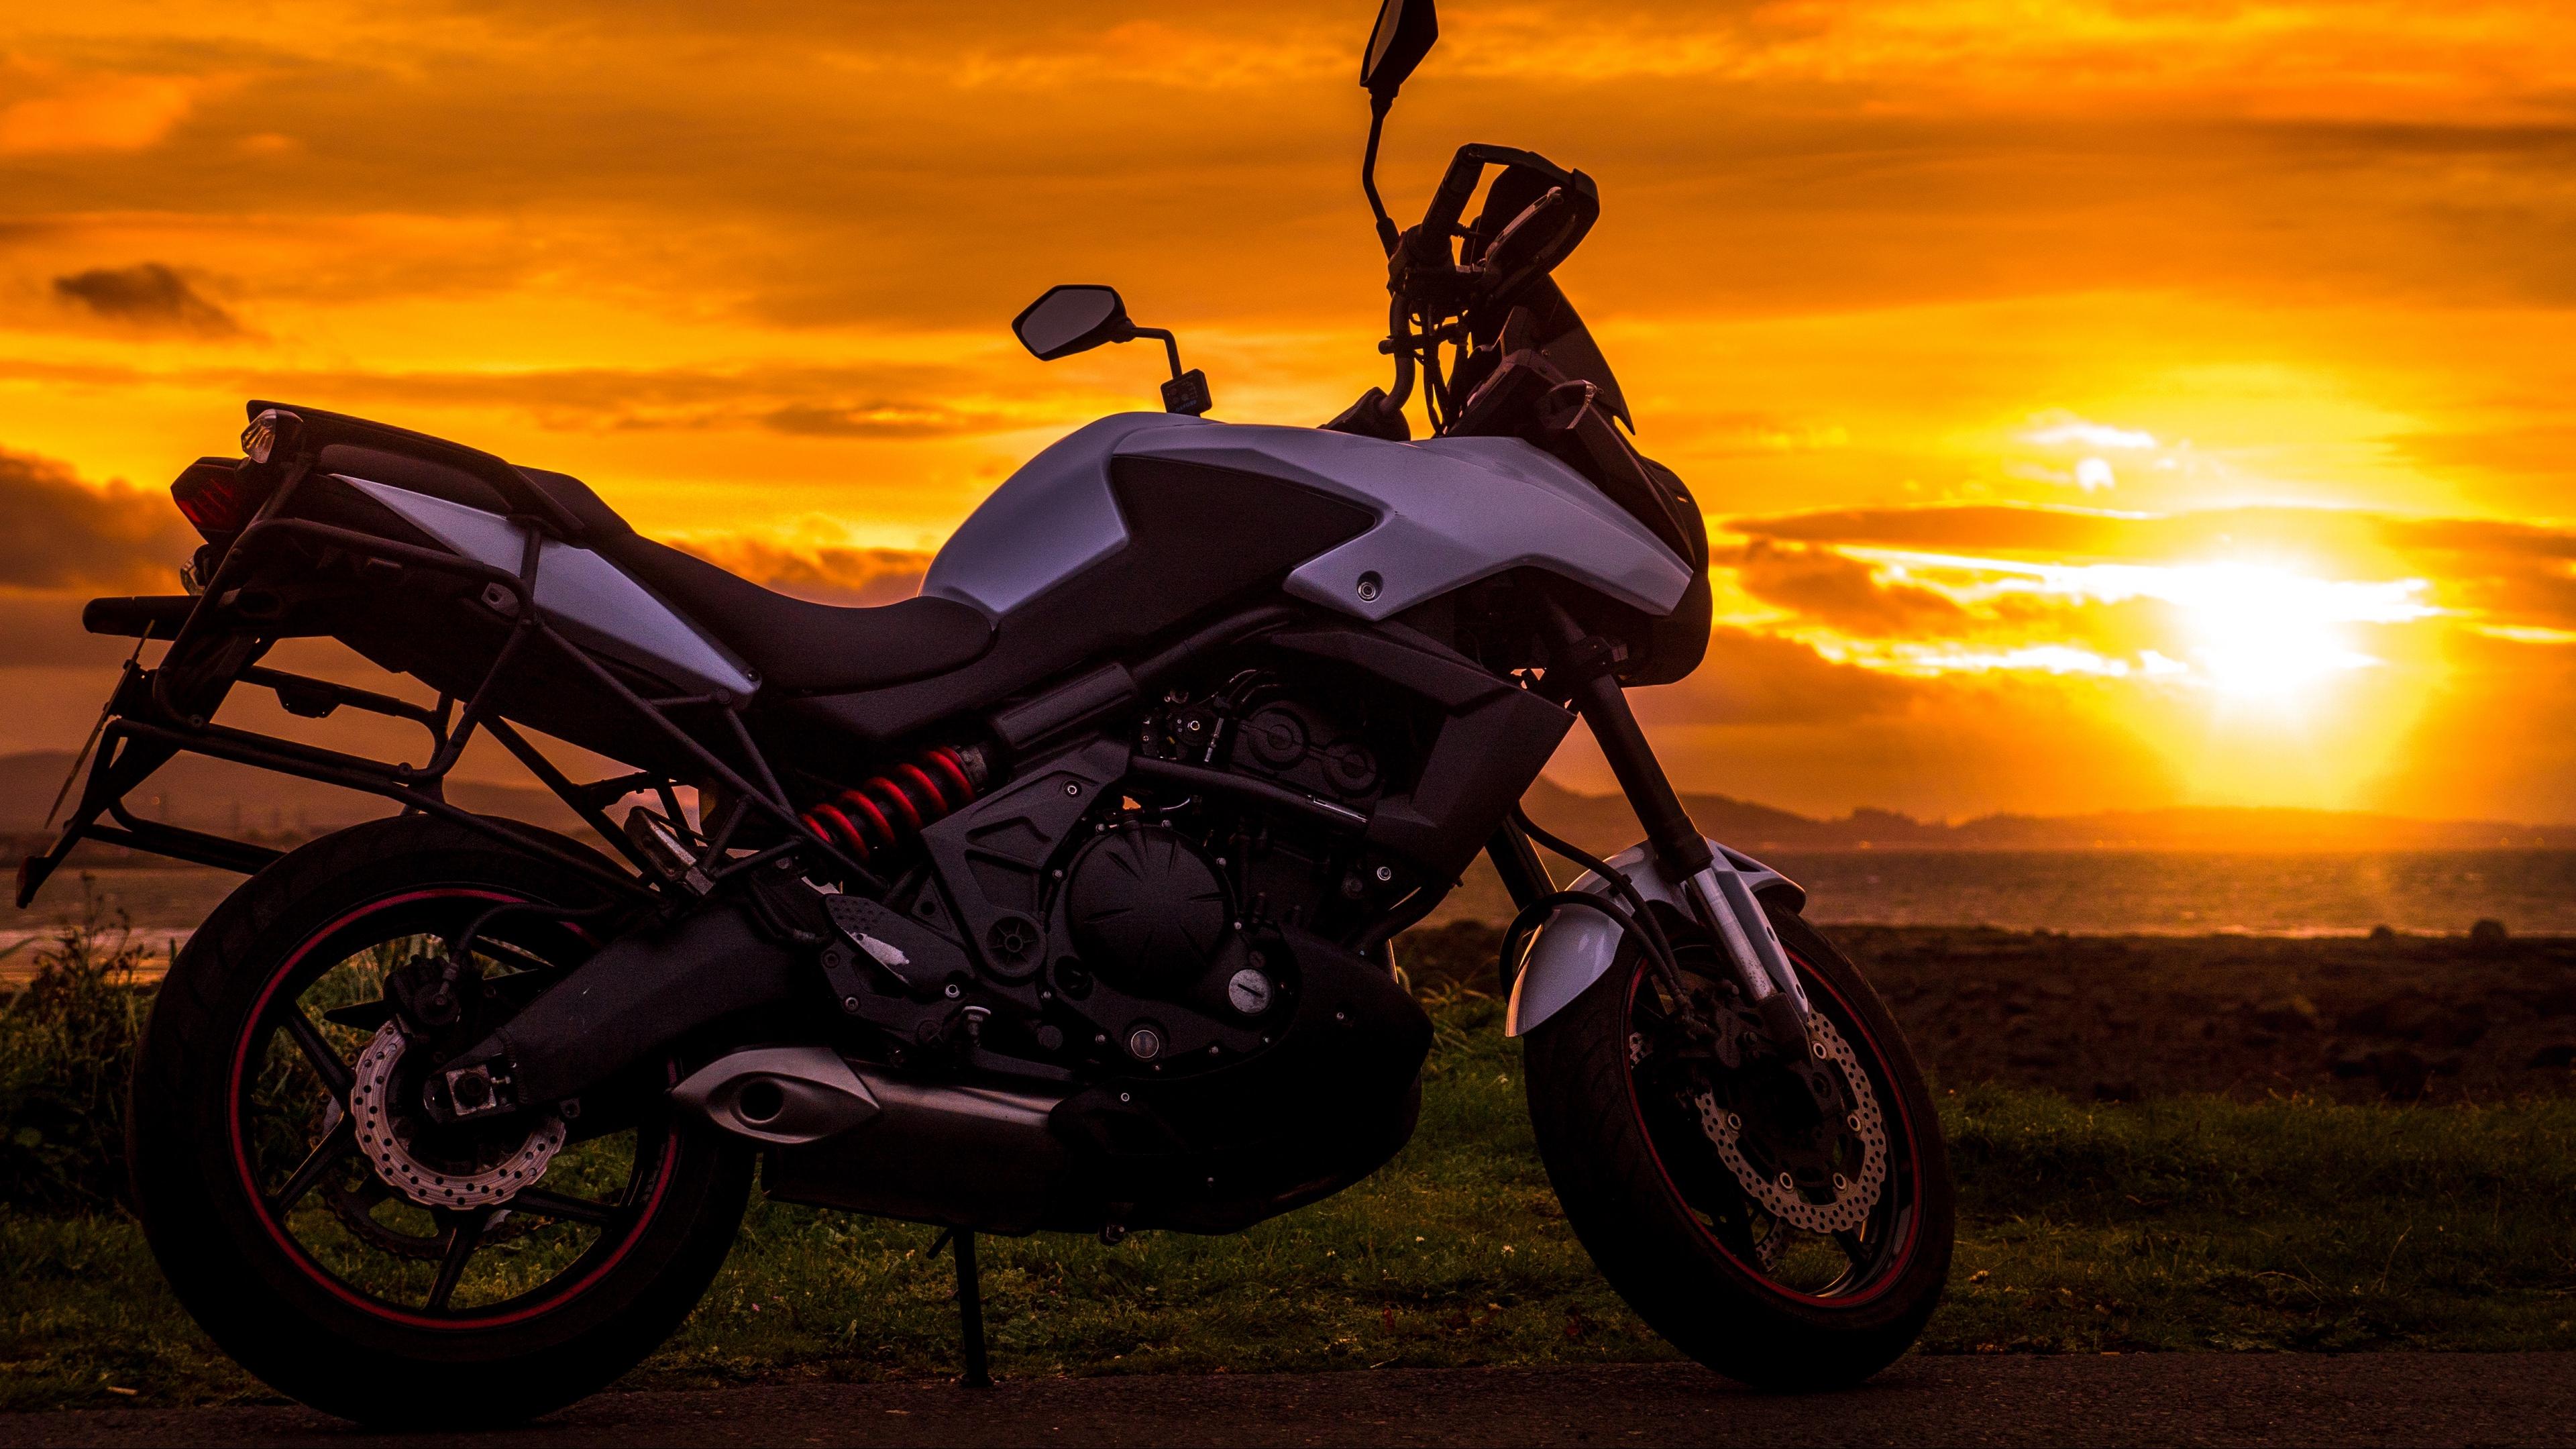 motorcycle sunset style 4k 1536018878 - motorcycle, sunset, style 4k - sunset, Style, Motorcycle